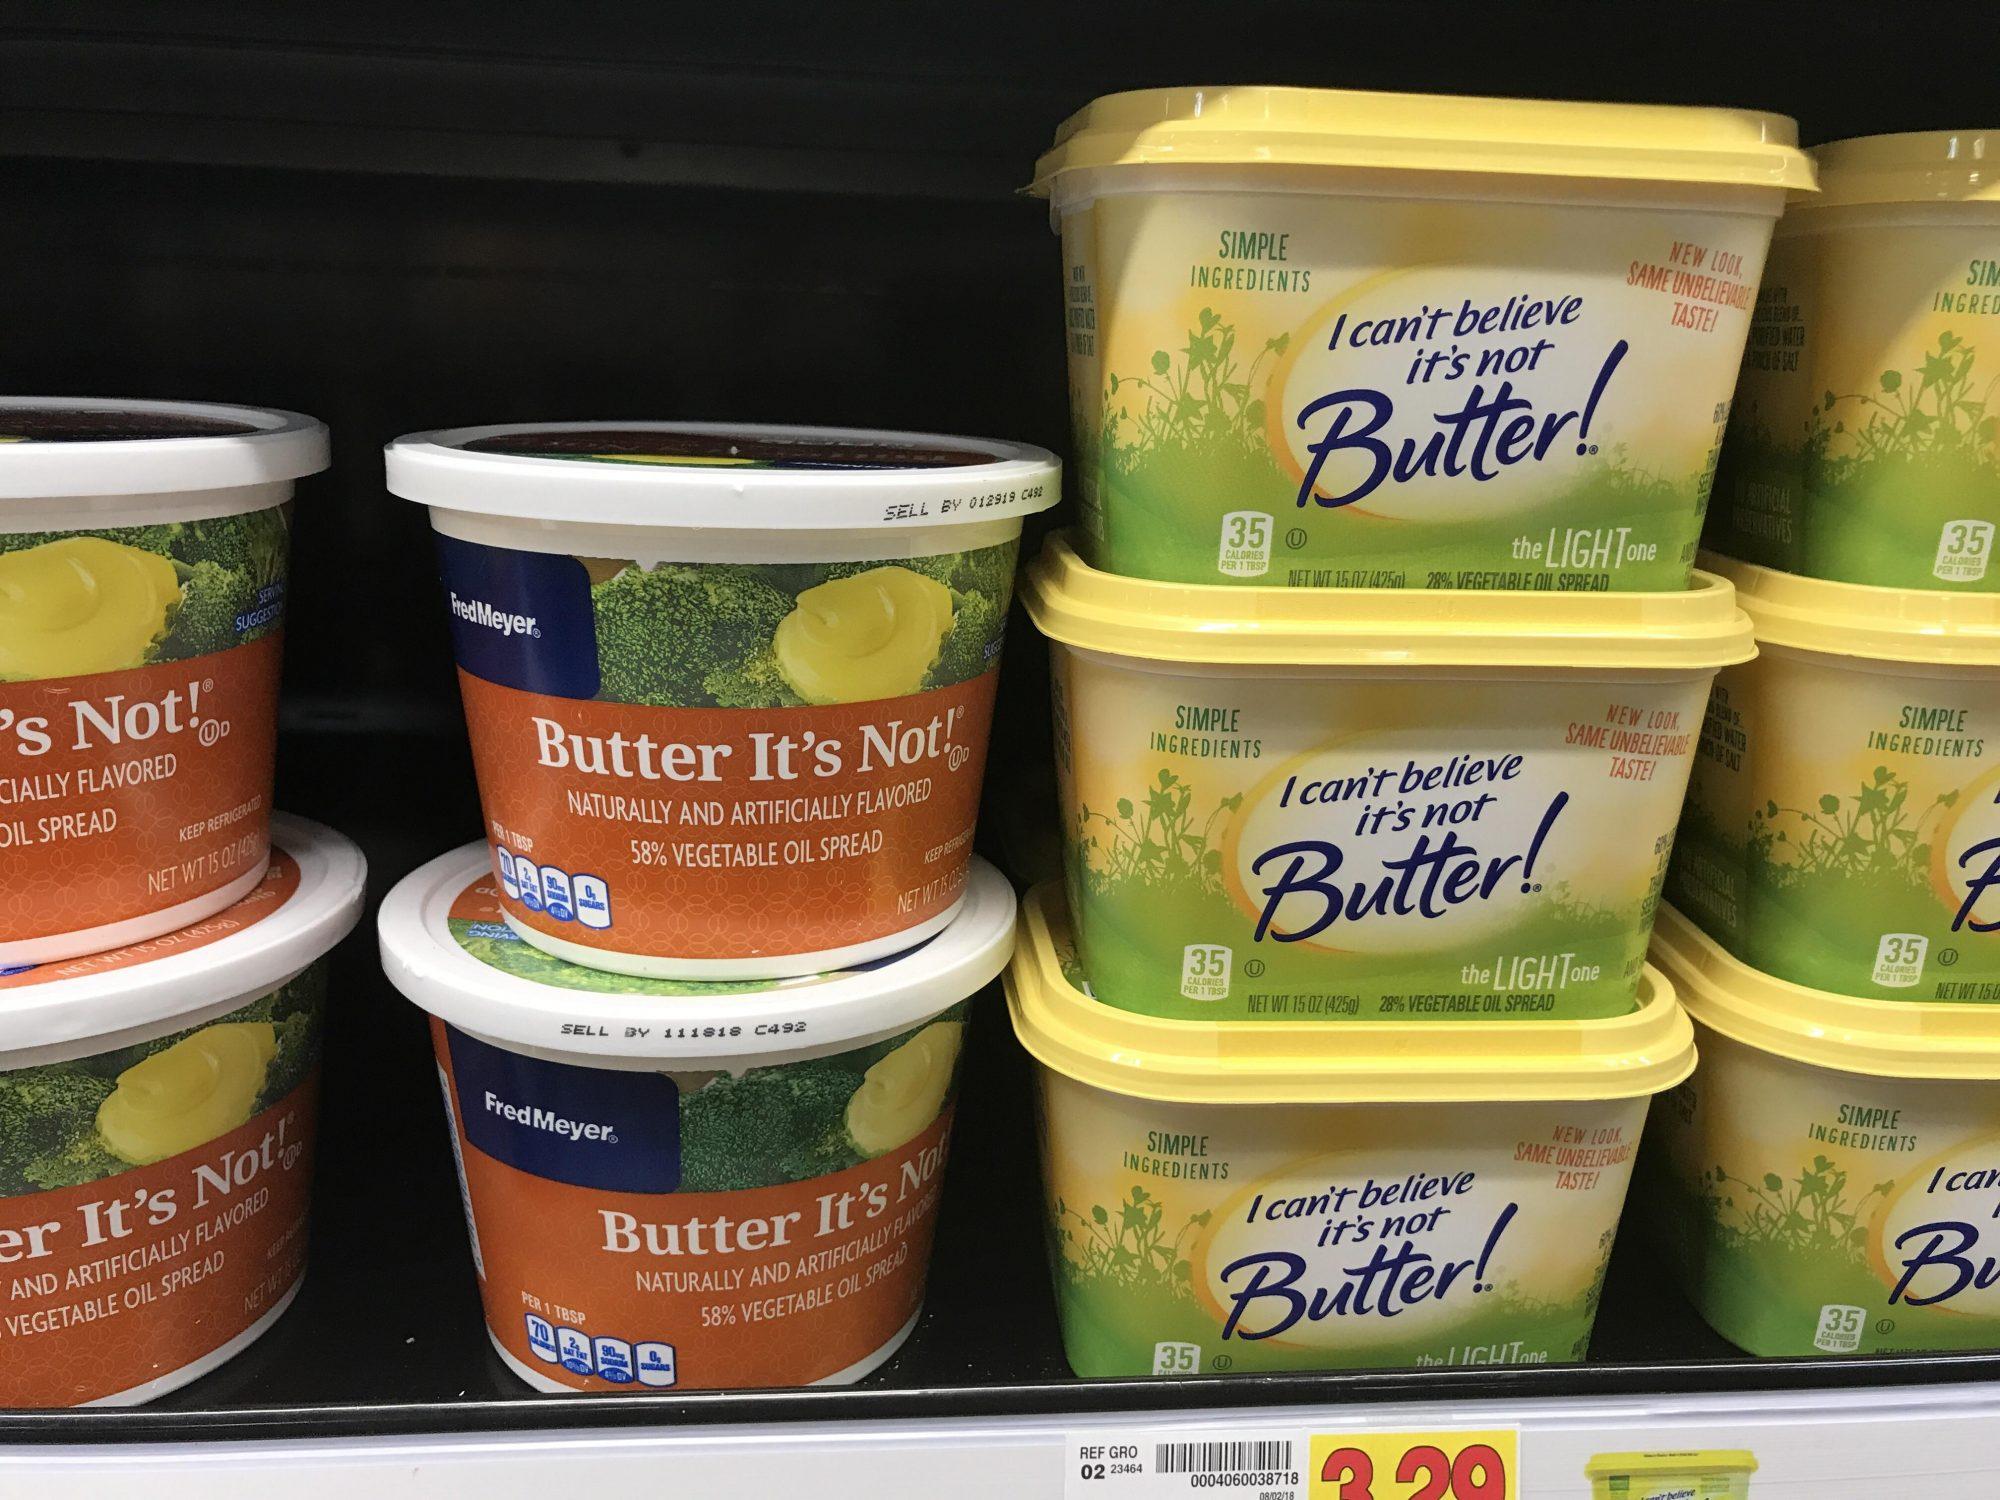 Butter It's Not